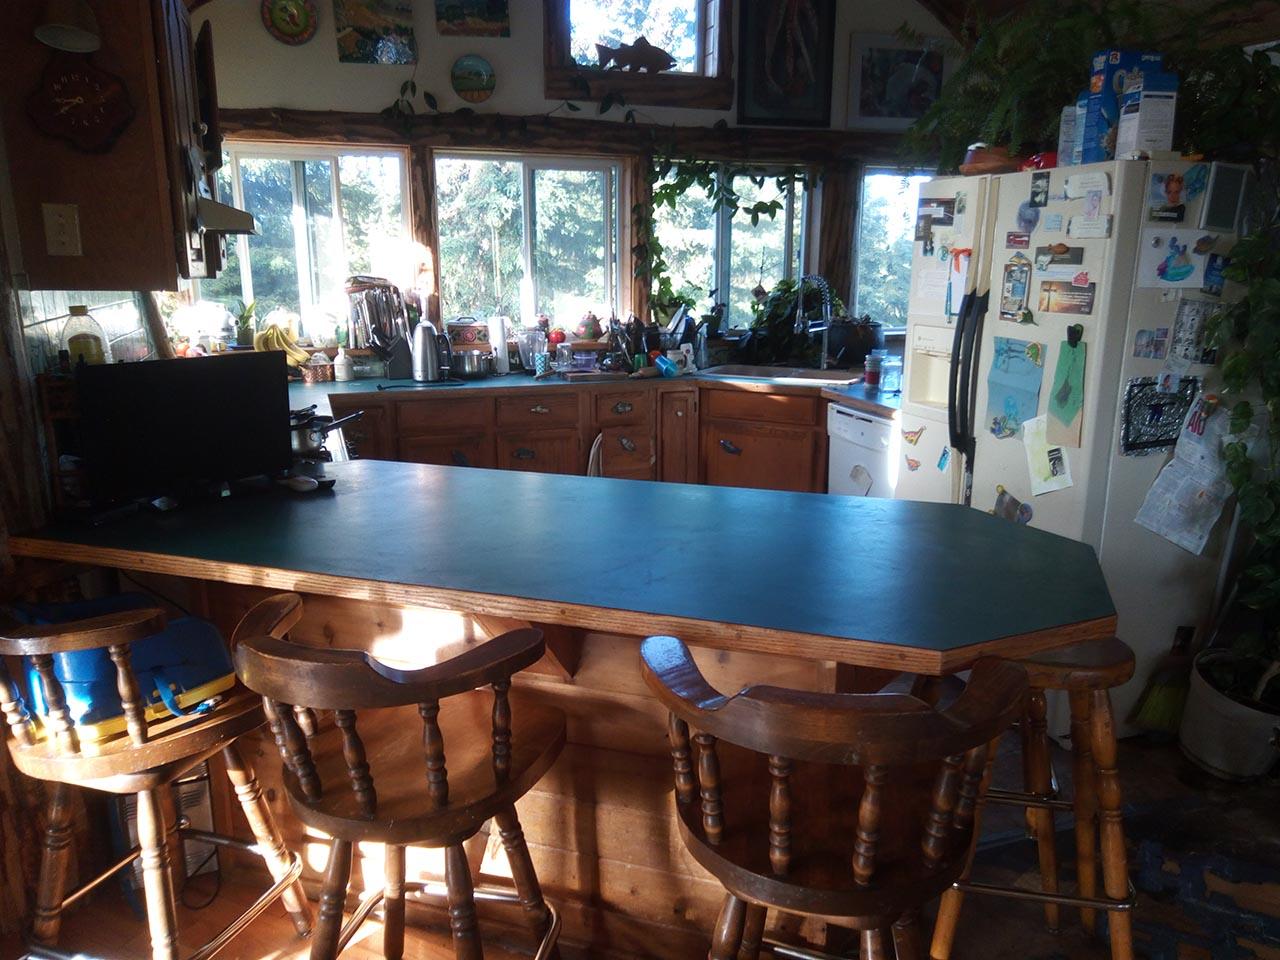 B&B kitchen.